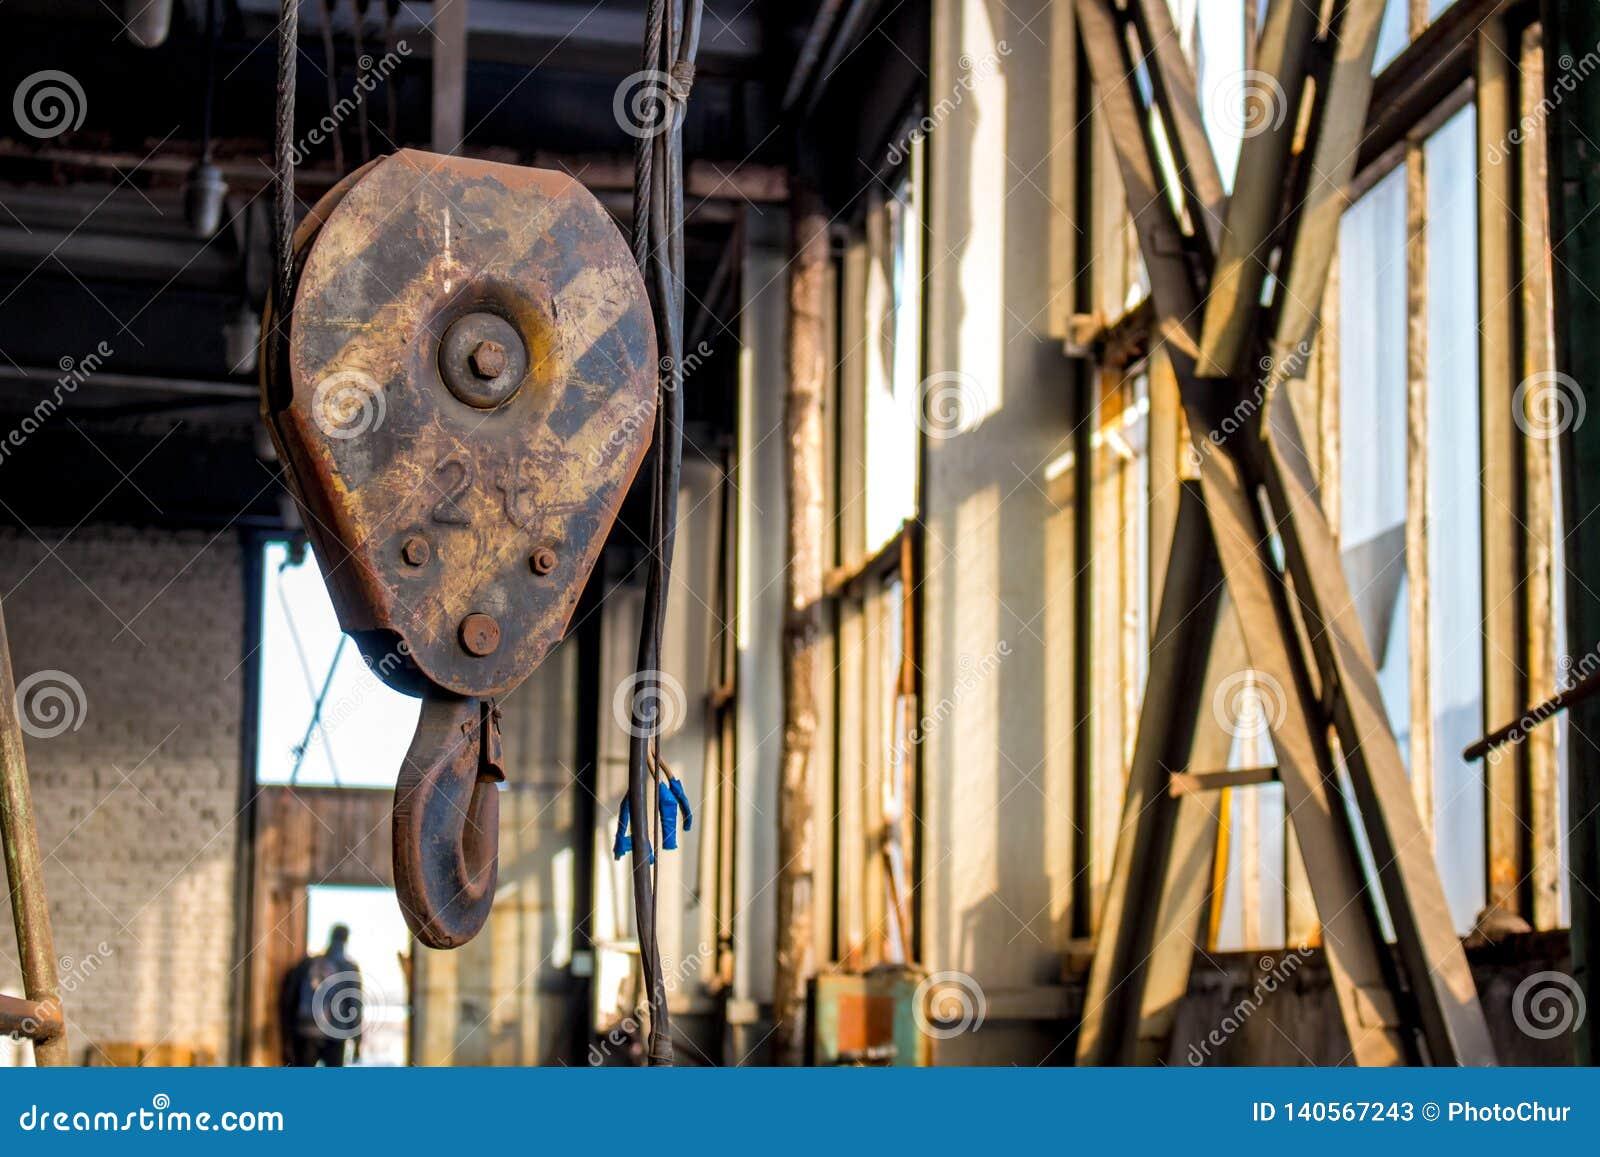 Metal lifting hook